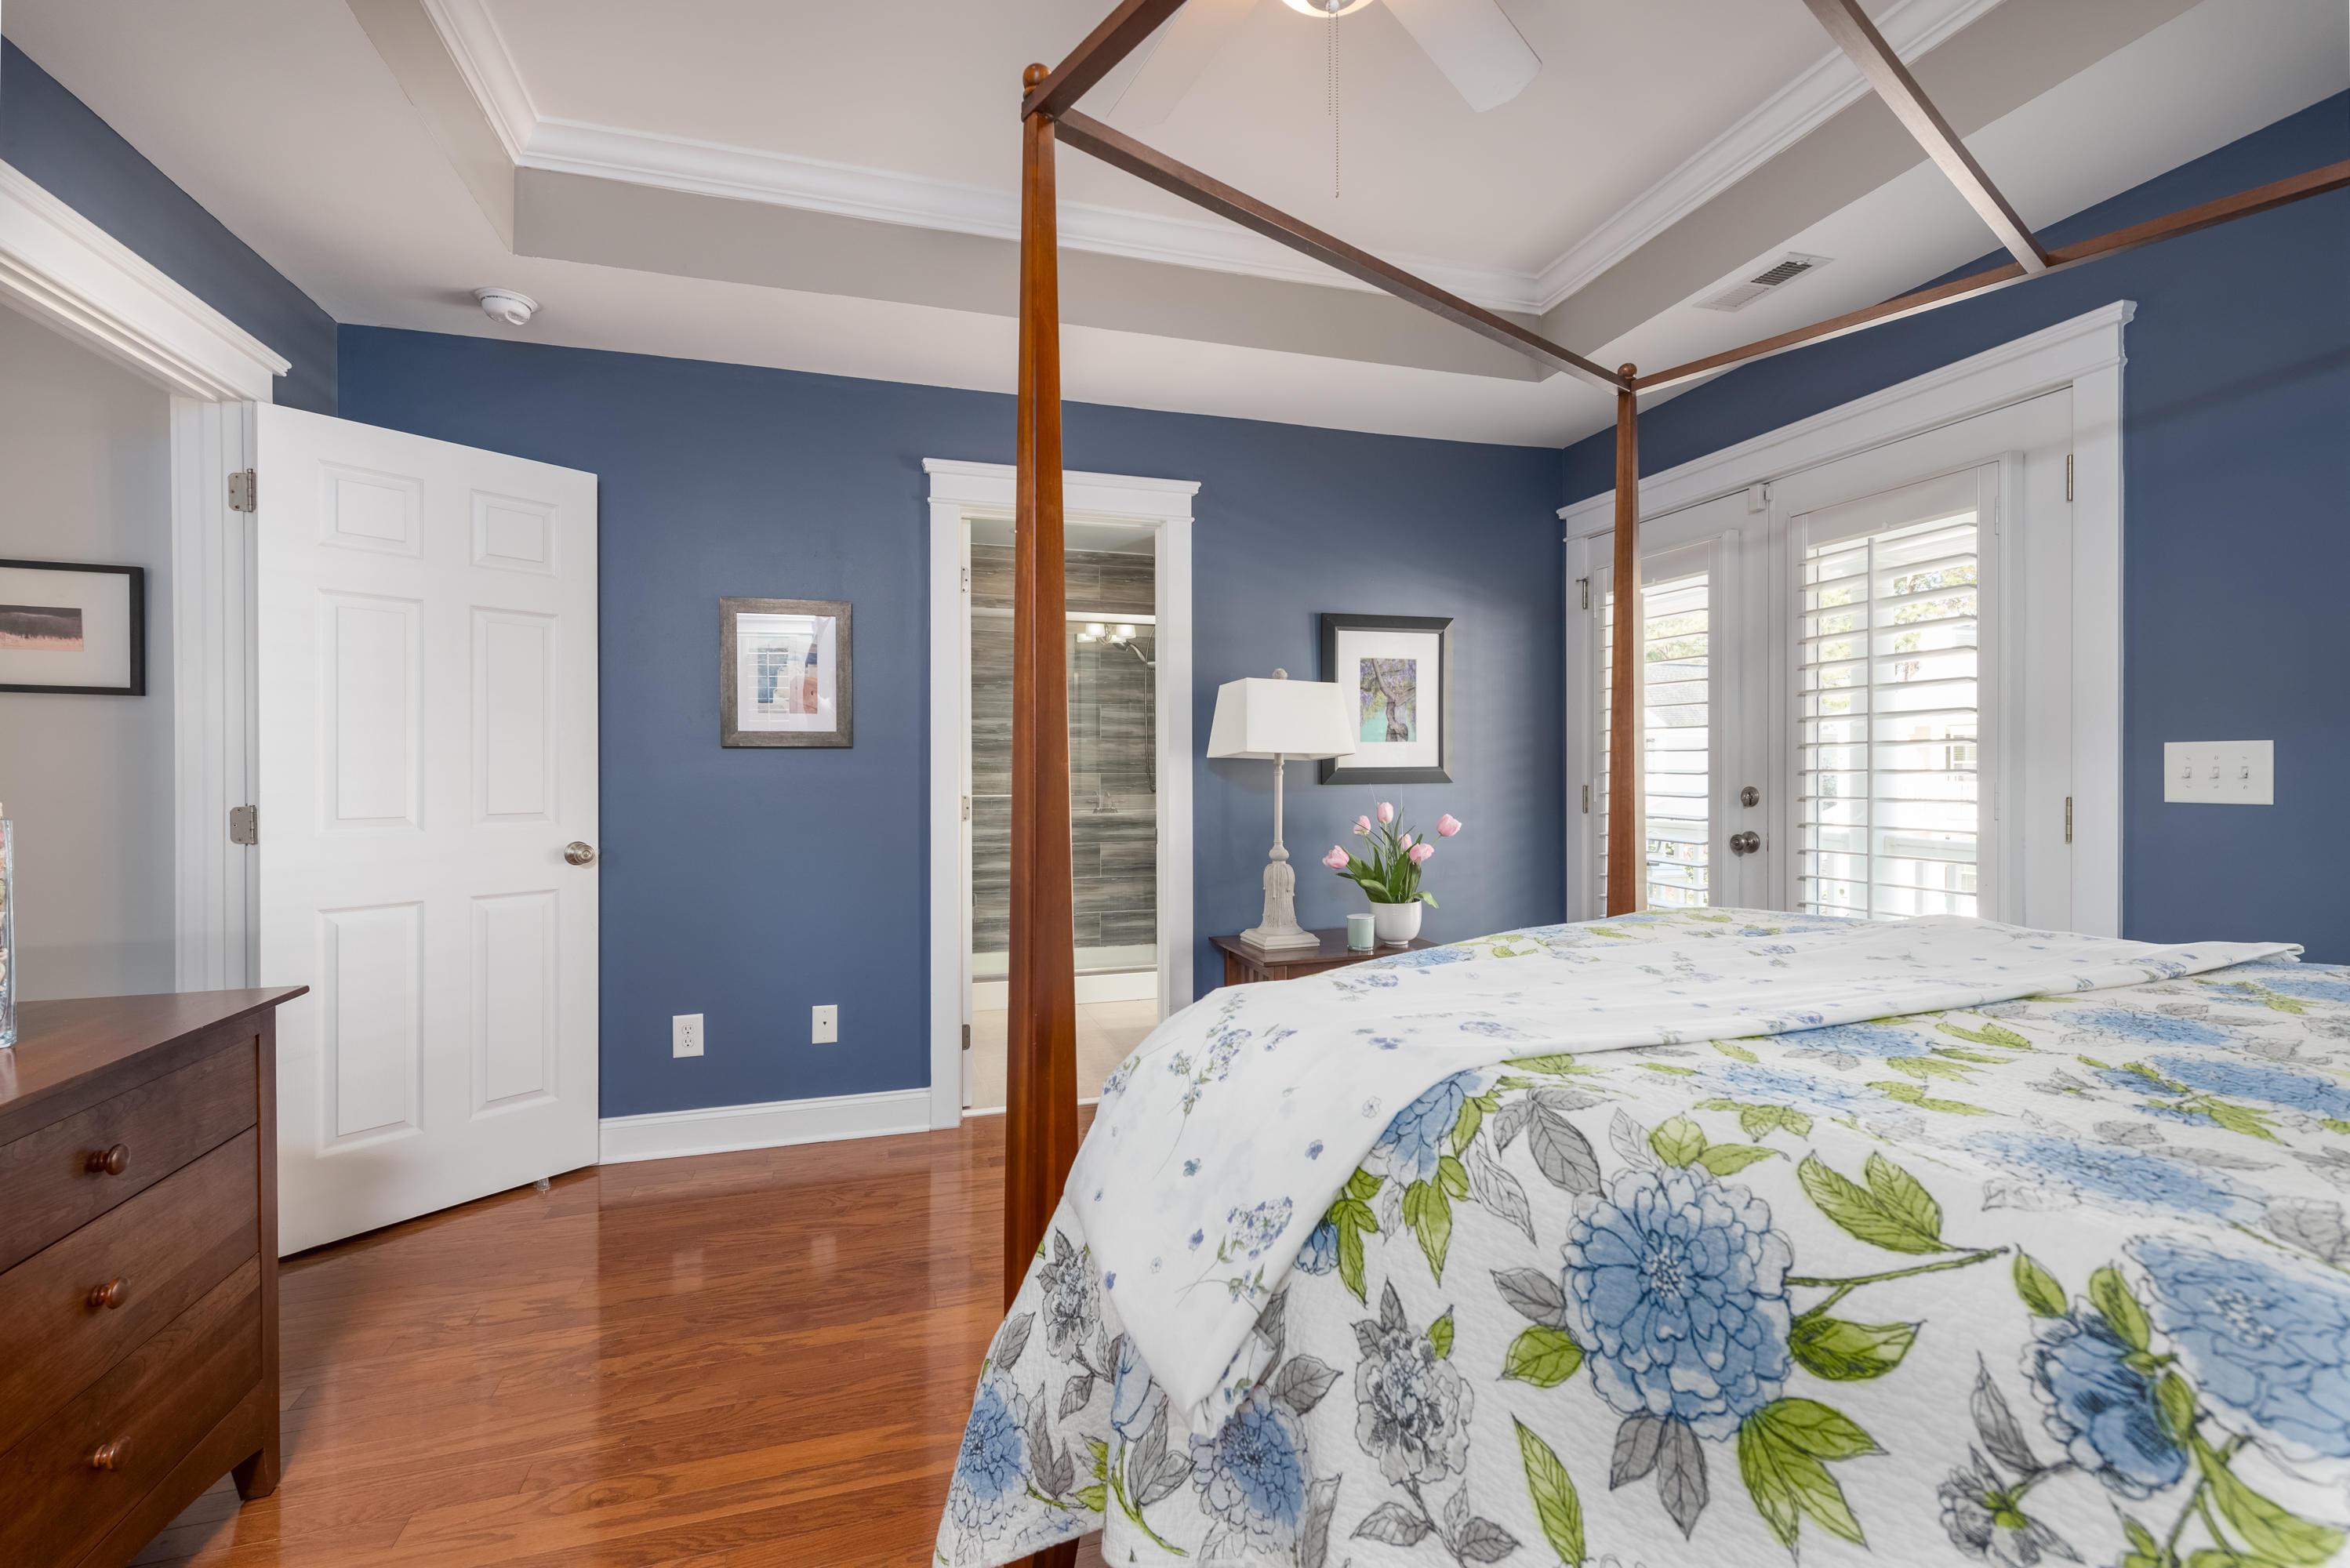 Carol Oaks Homes For Sale - 2813 Caitlins, Mount Pleasant, SC - 37